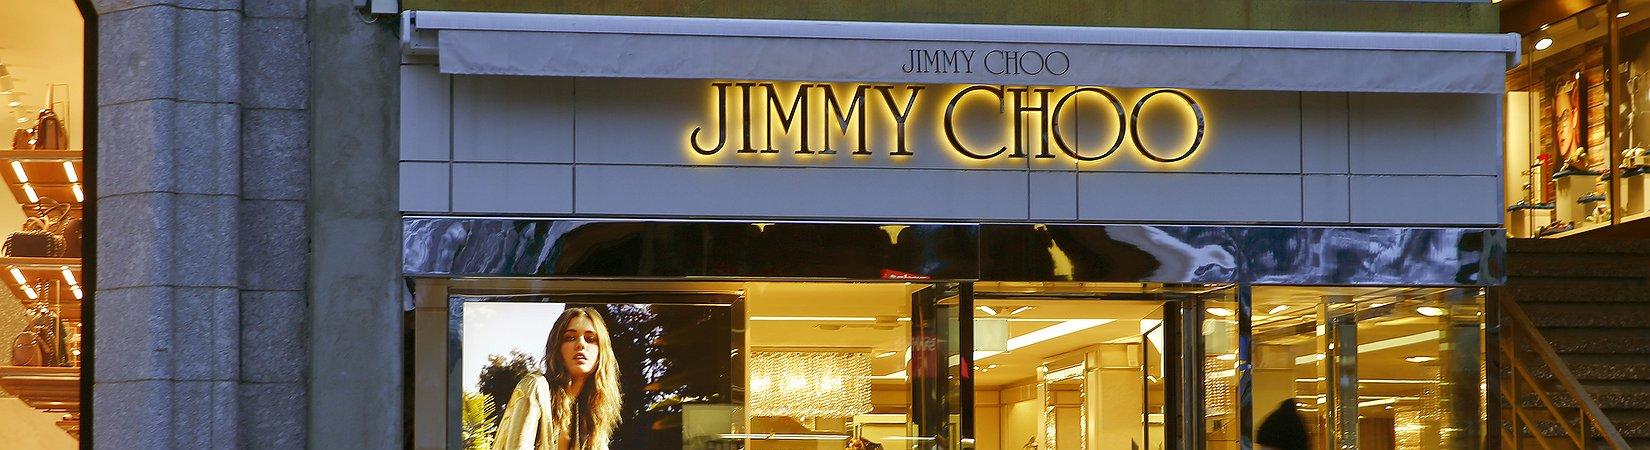 Luxury goods maker Jimmy Choo up for sale